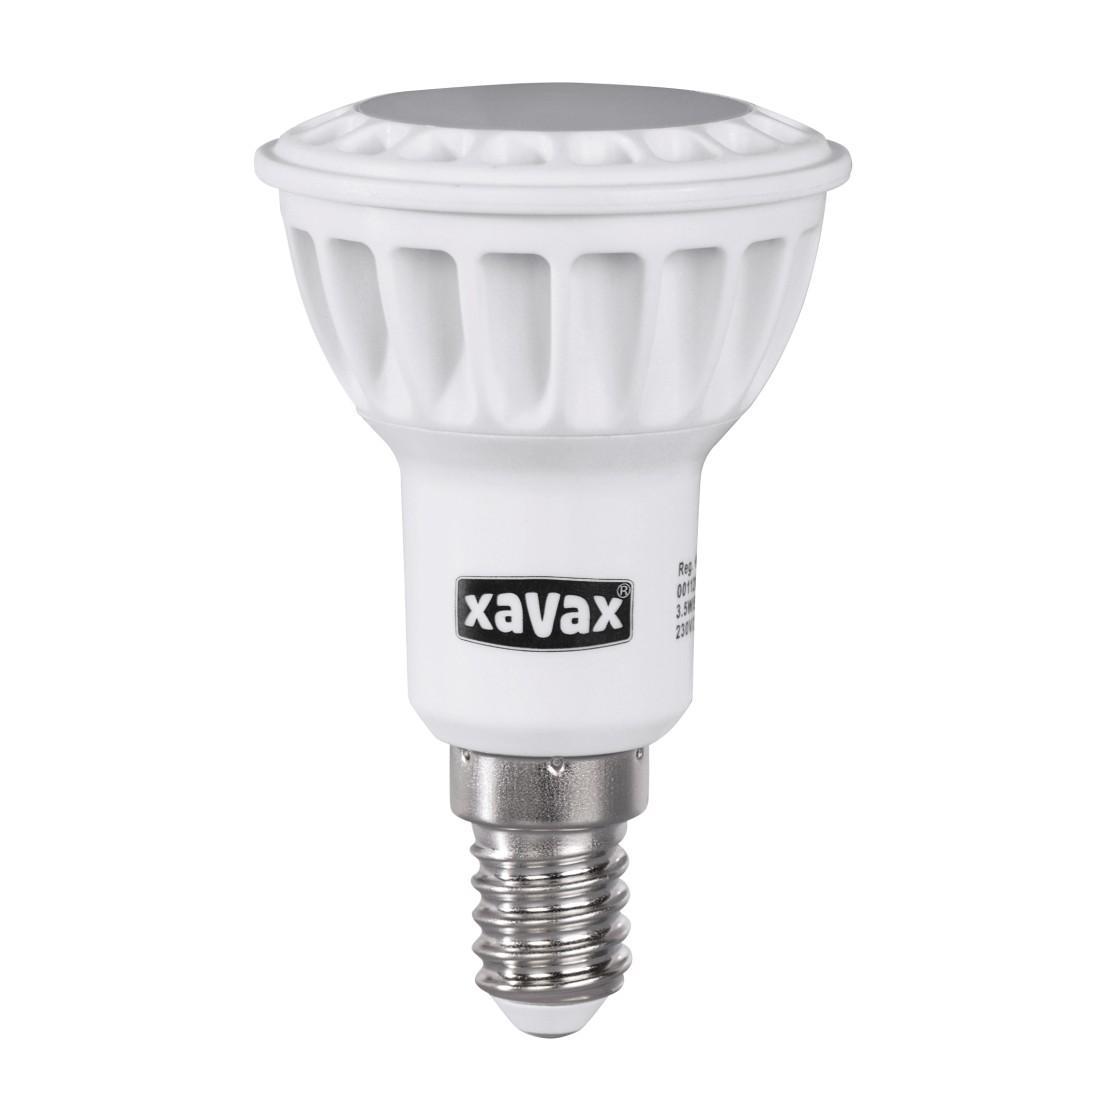 LED крушка XAVAX 112089, 230V, 3.5W, E14, PAR 16, 3000K, bulb